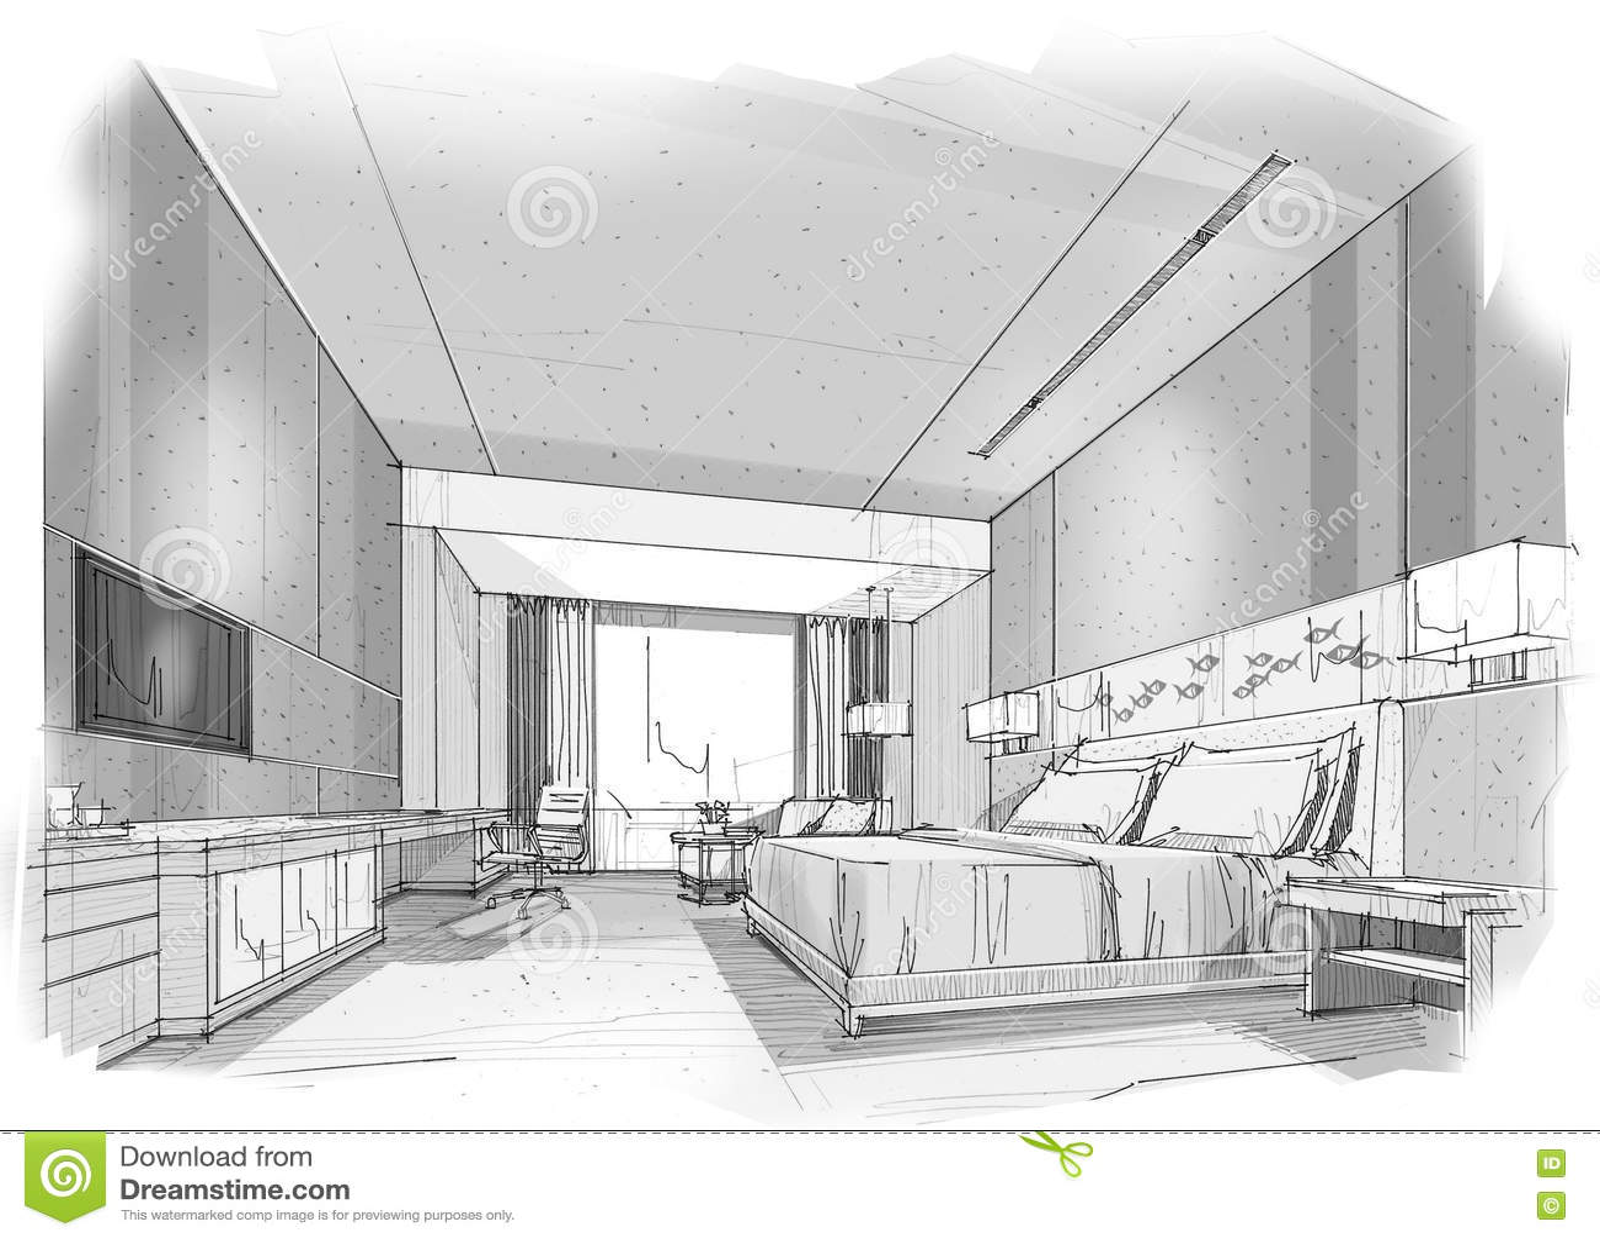 Bedroom drawing with color -  Bedroom Black Color Interior Perspective Sketch Download